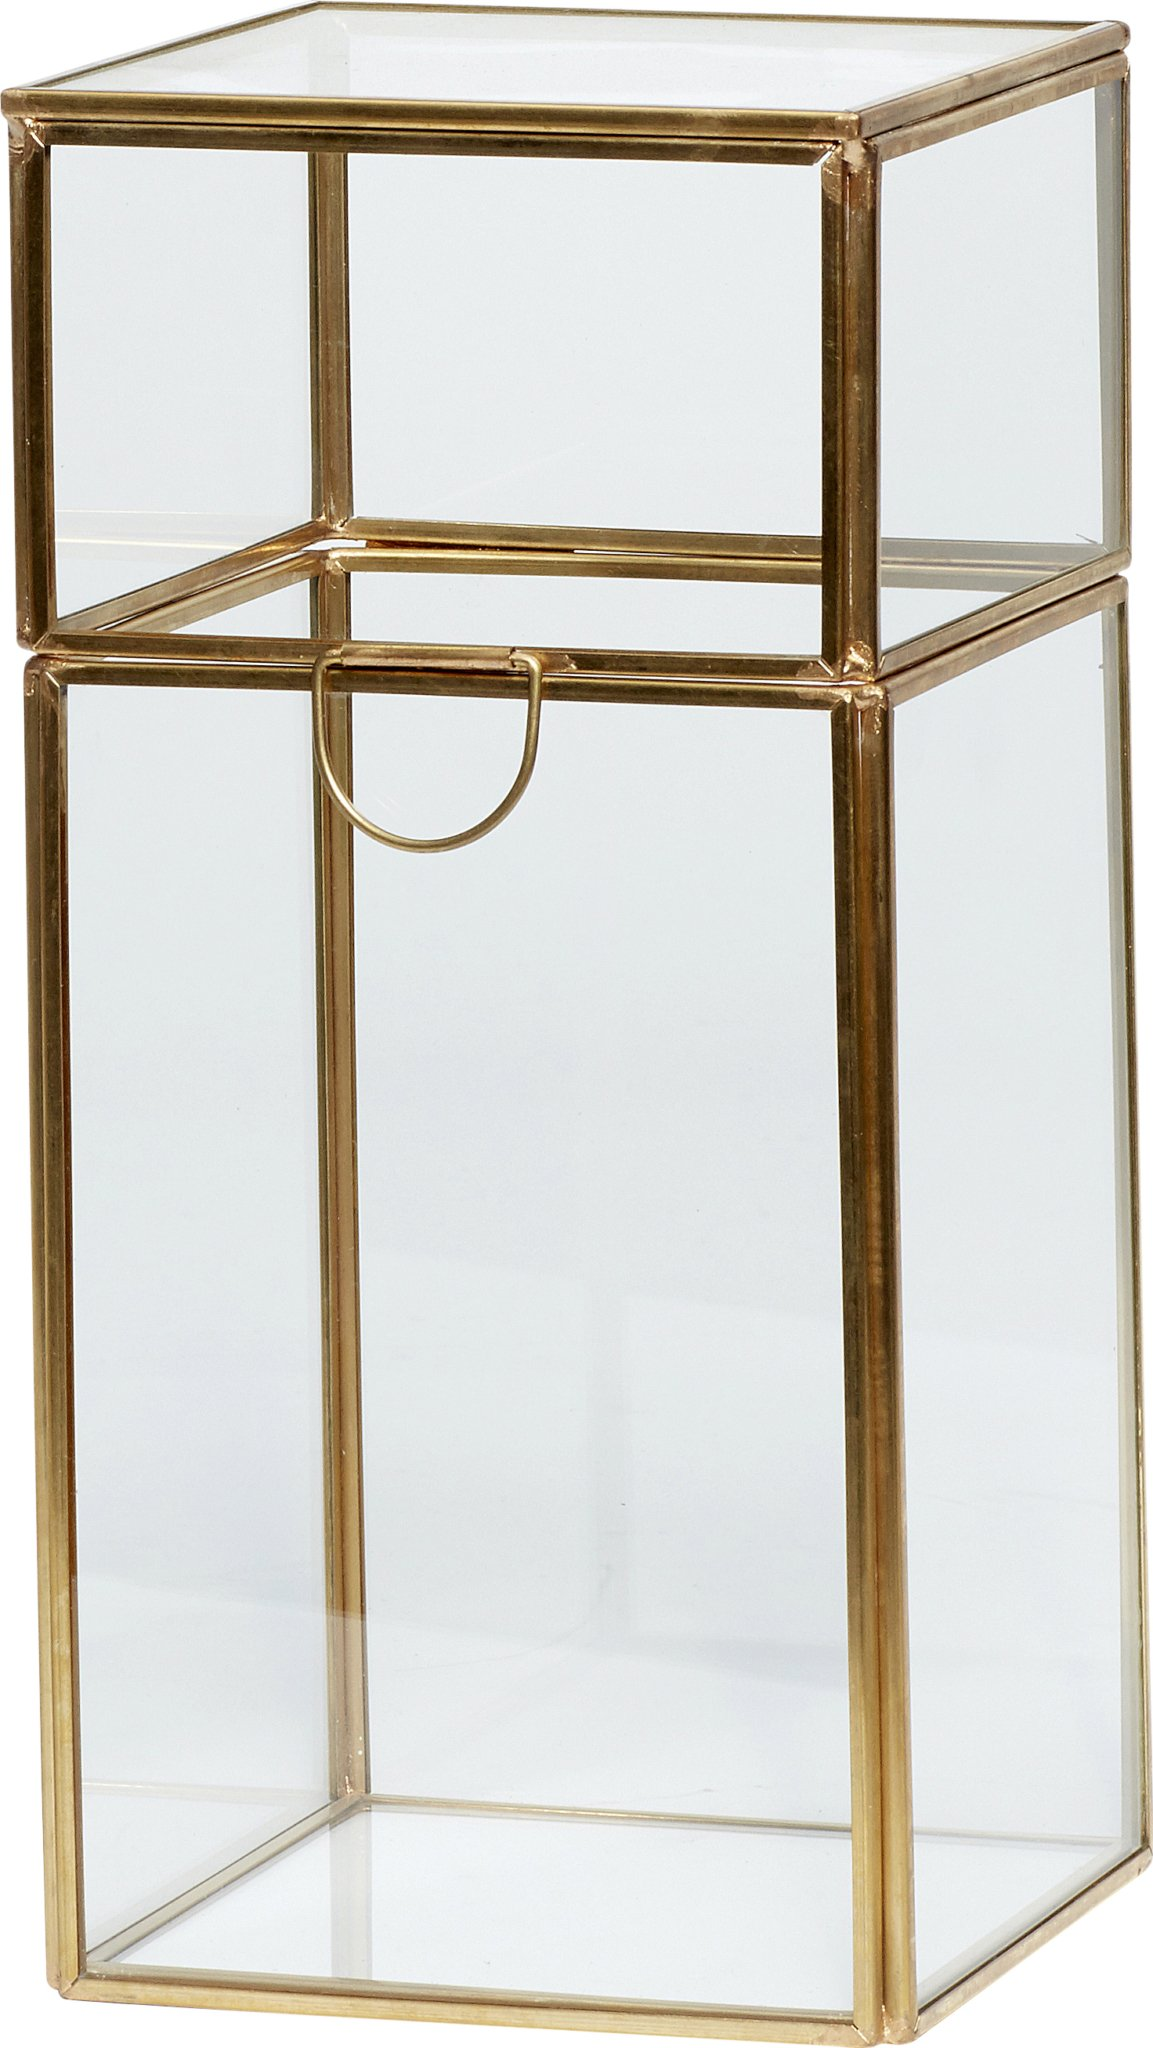 Image of   Glasboks, Signy by Hübsch (H: 26 cm. B: 12 cm. L: 12 cm., Messing/Klar)